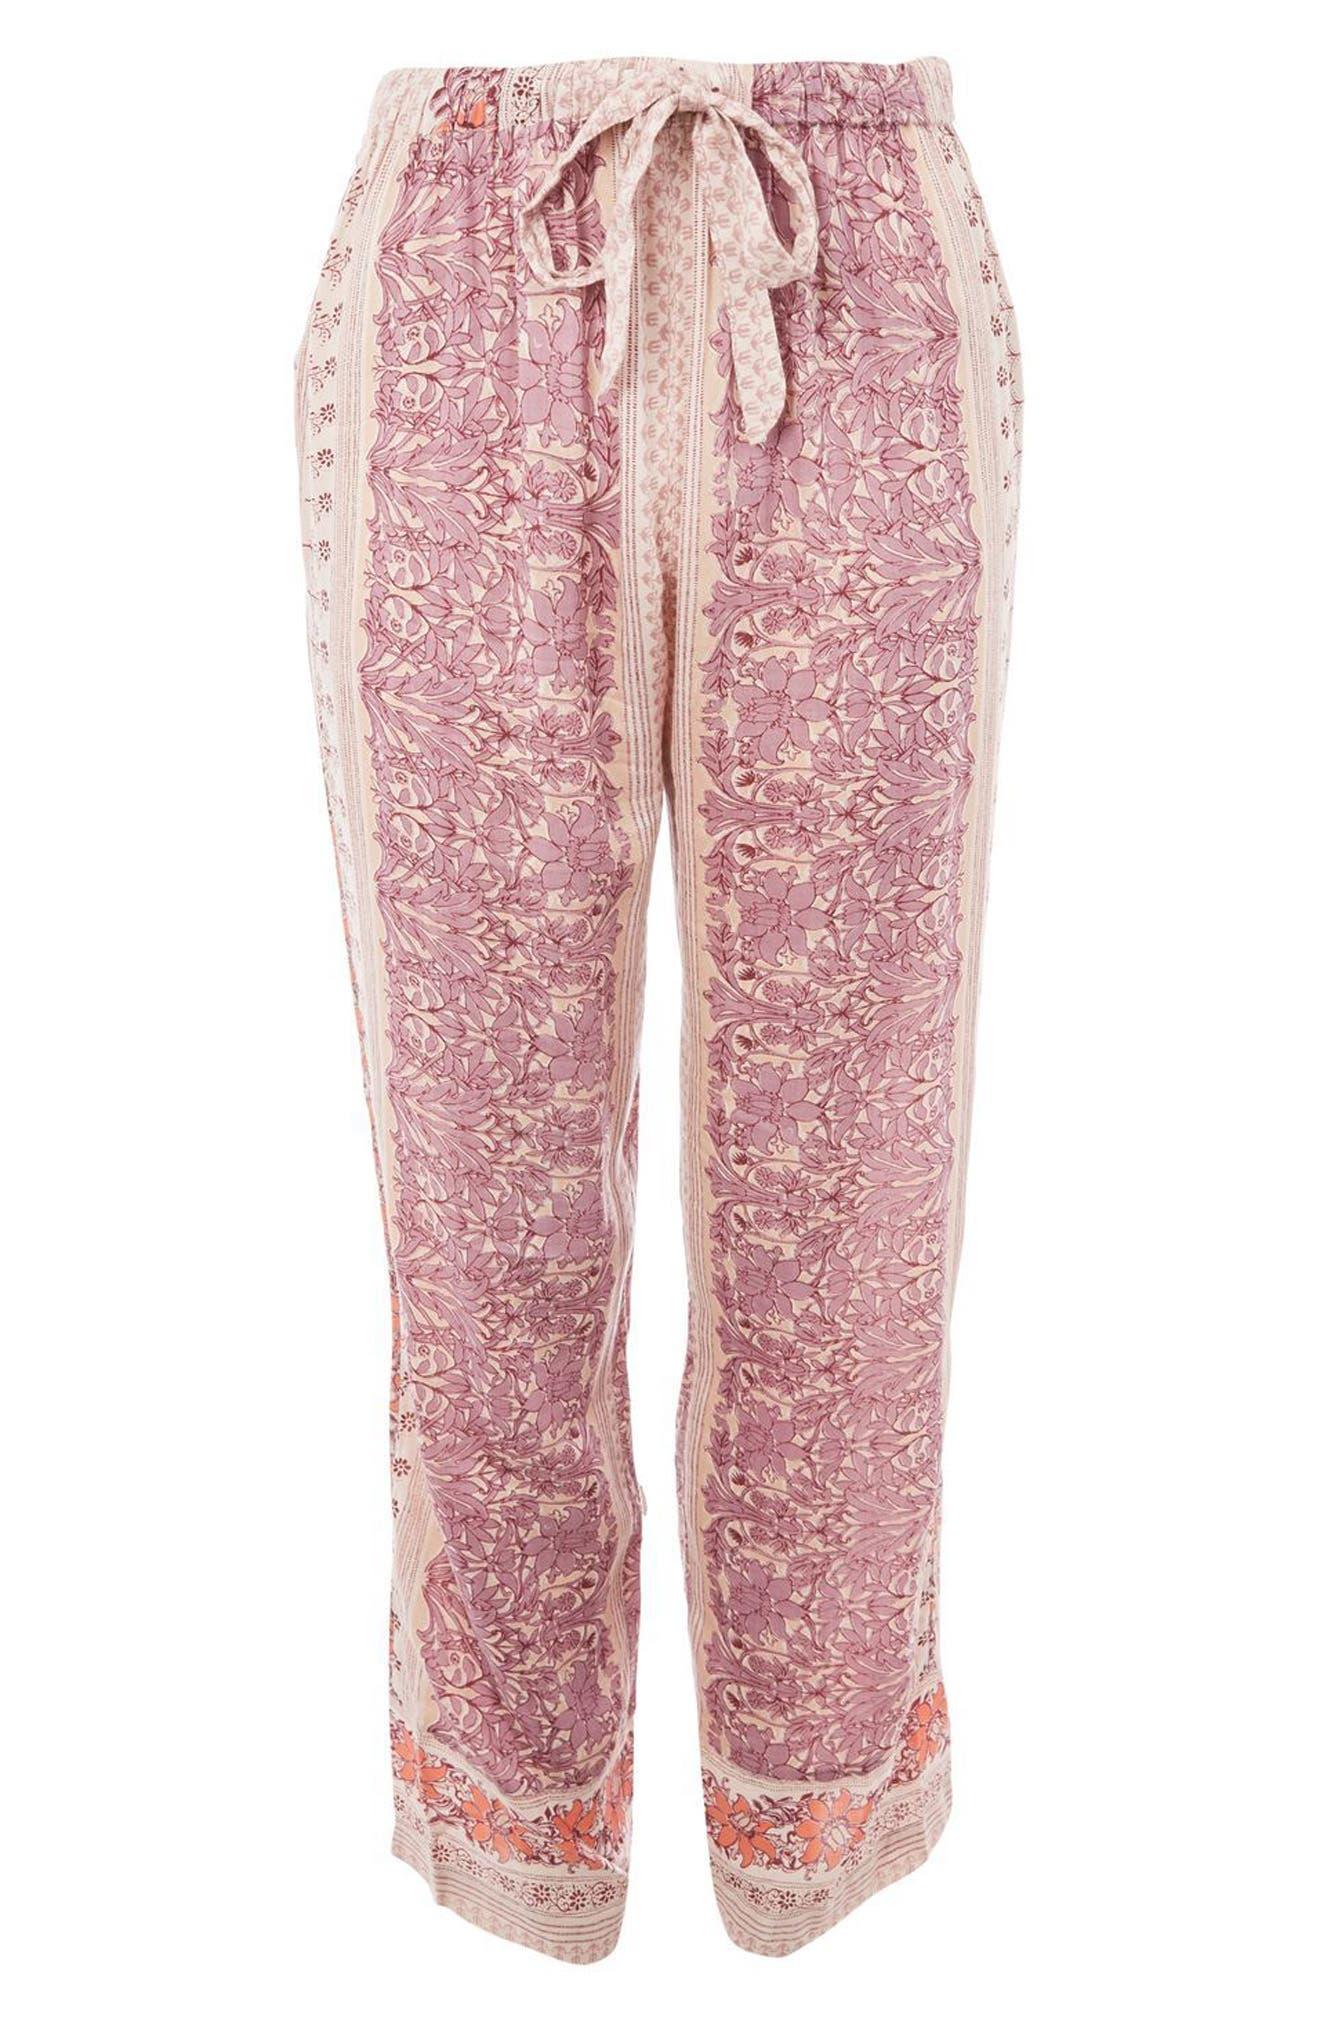 Bohemian Floral Print Pajama Pants,                             Alternate thumbnail 3, color,                             530